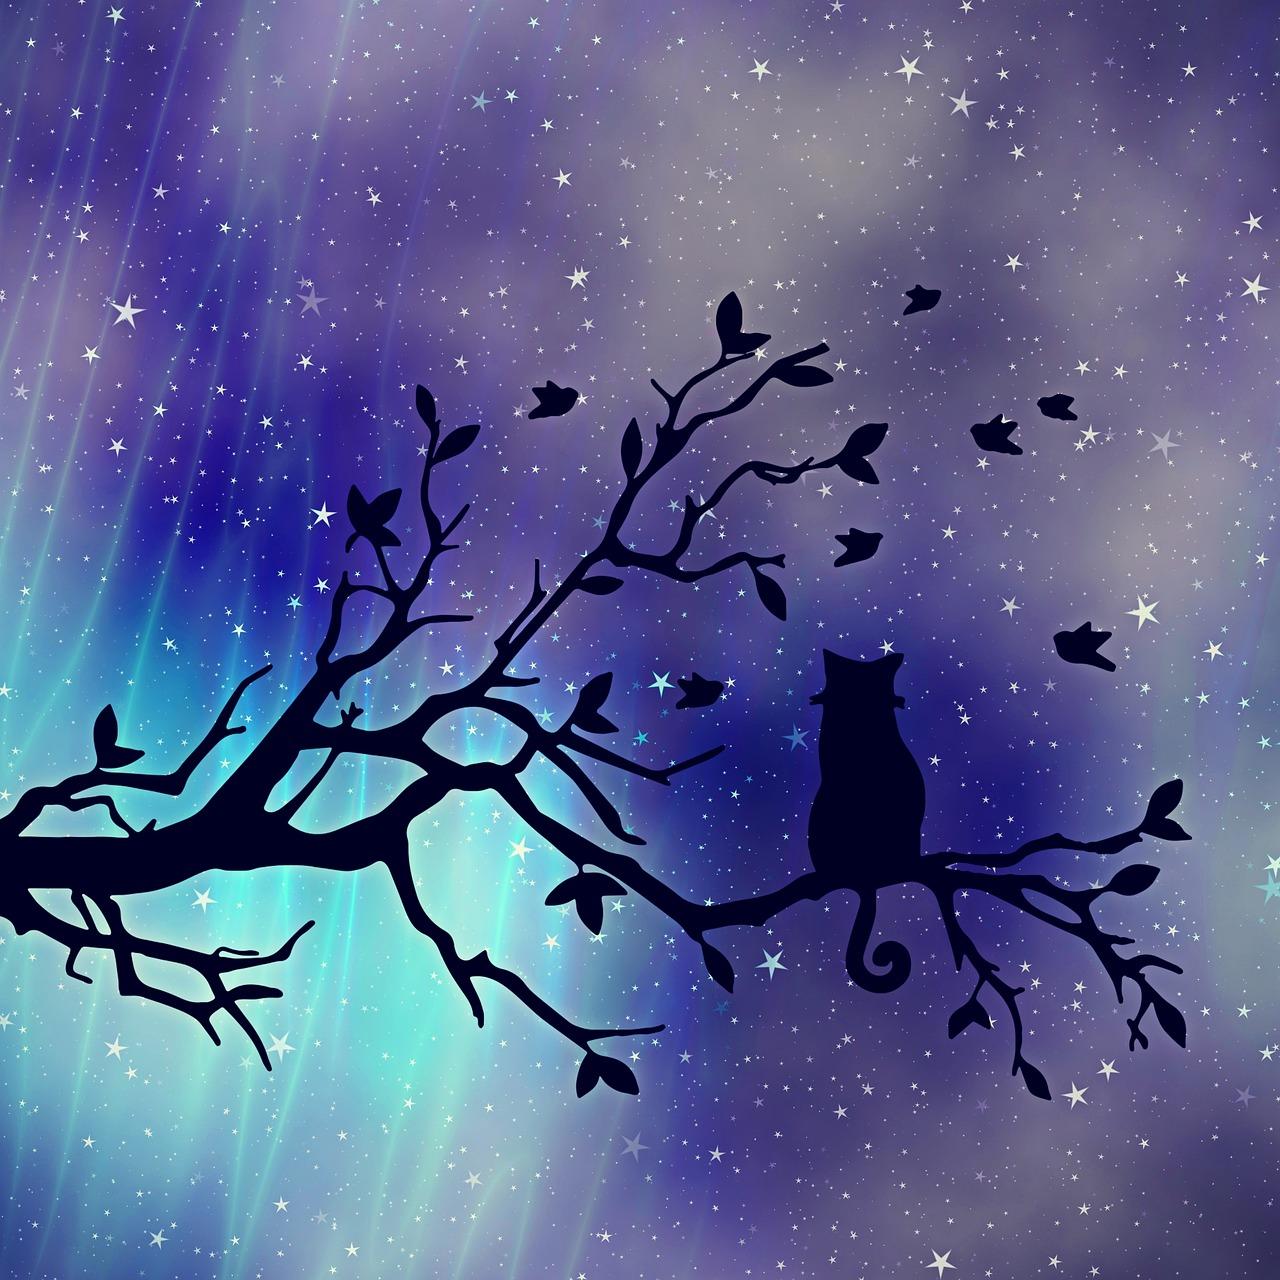 Many Starry Nights